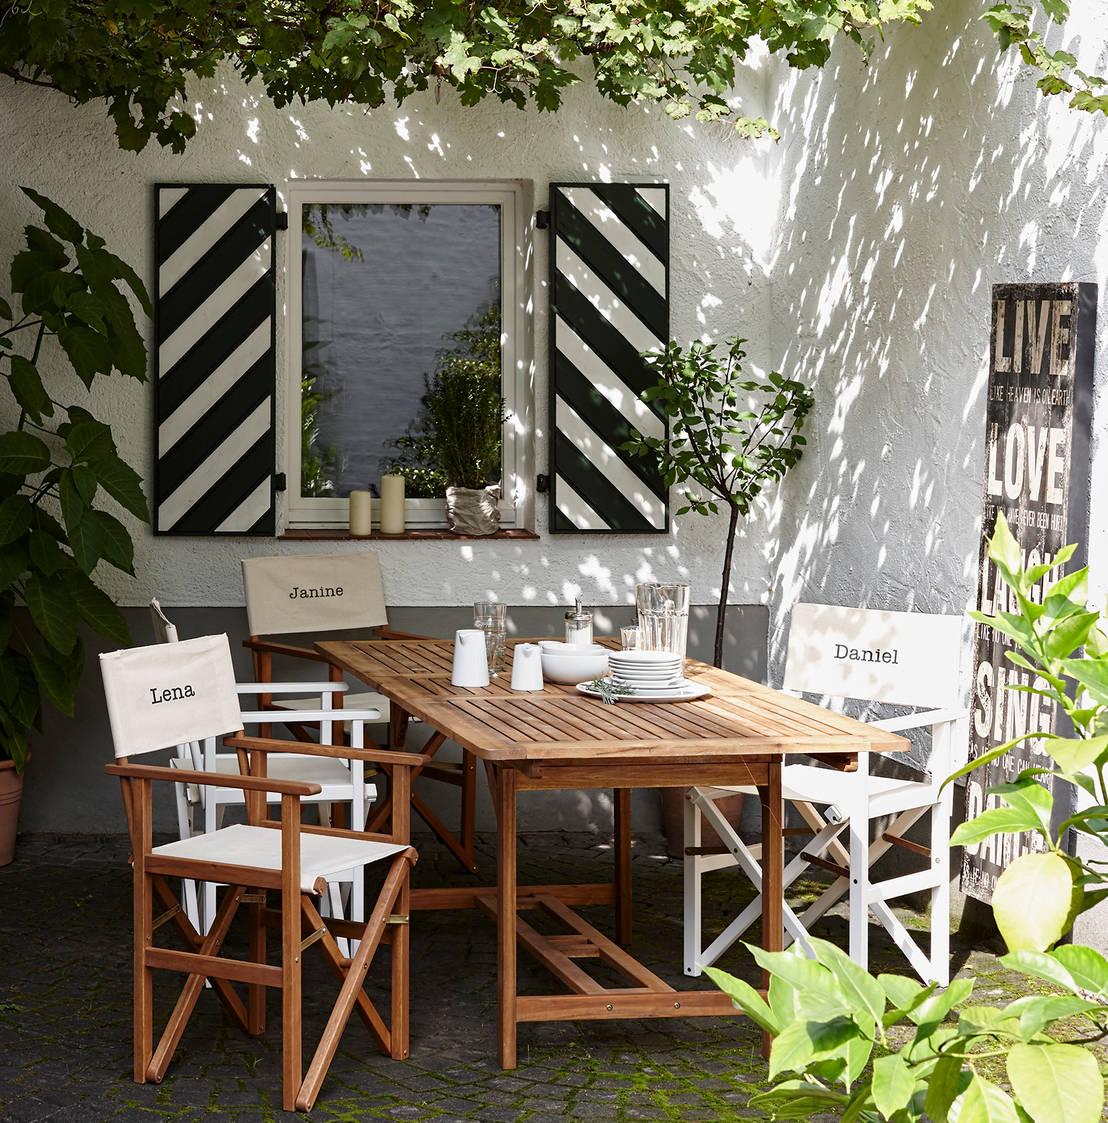 Interior Styling Butlers Gartenkatalog 2015 Por Rasa En